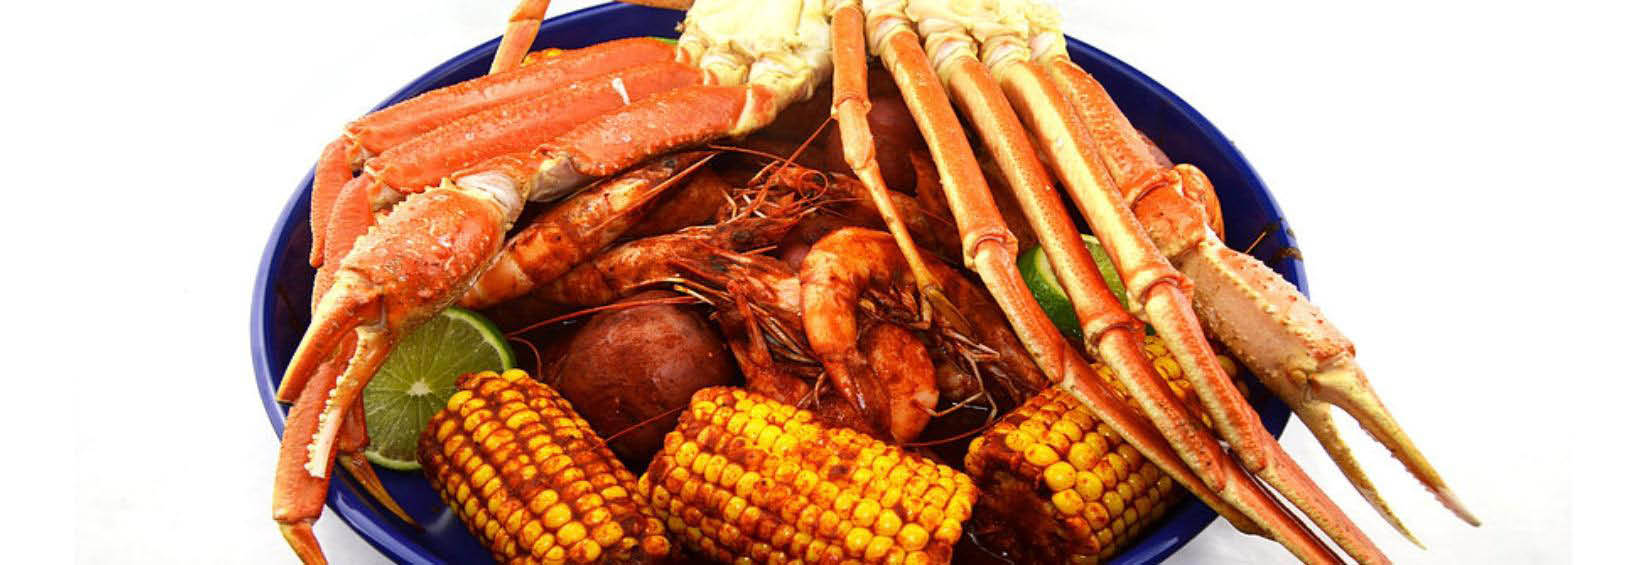 ragin-crab-cafe-dallas-texas-banner